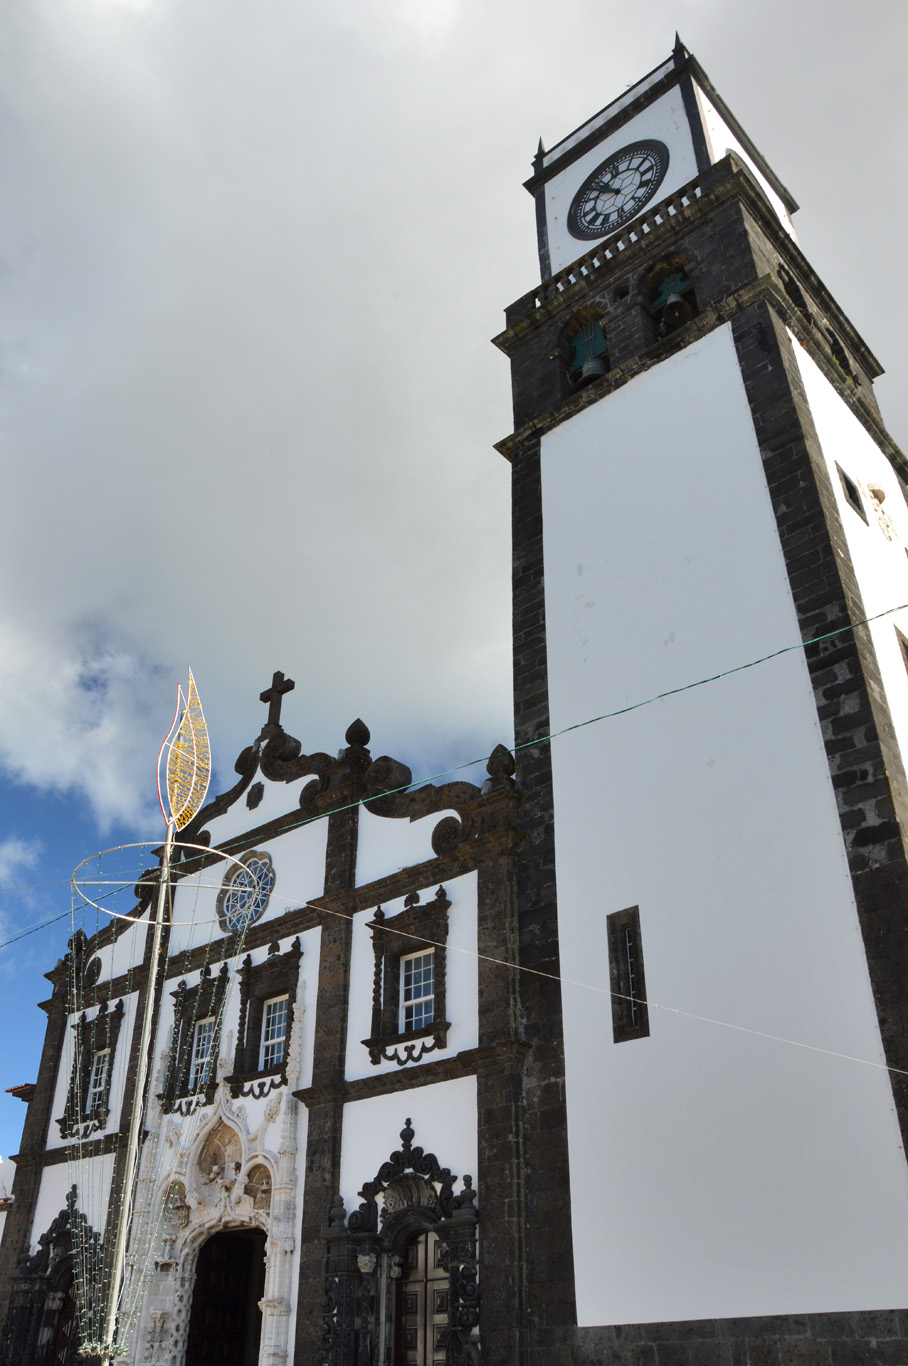 The clock tower of the Church of St. Sebastian